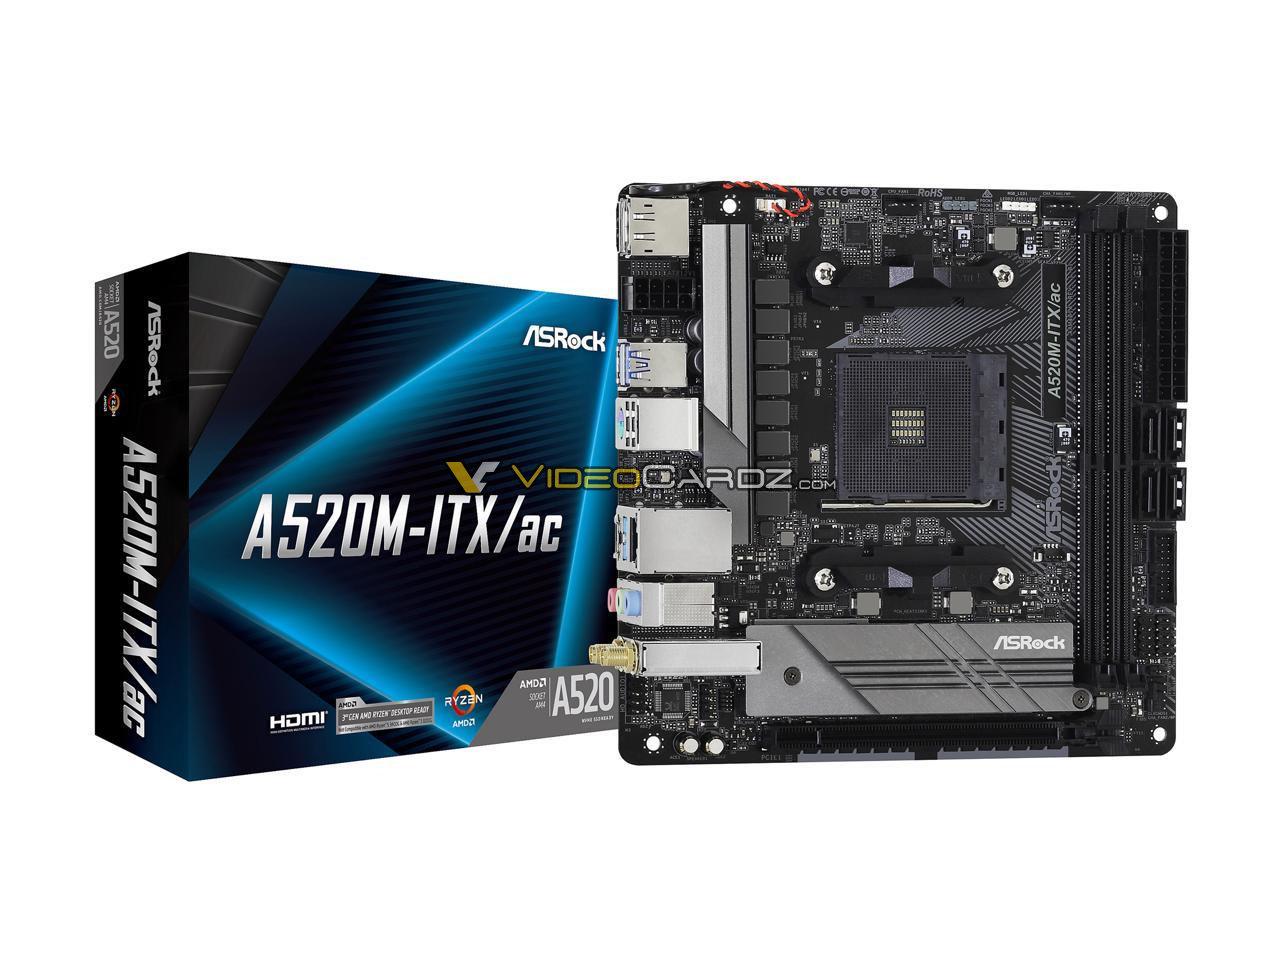 asrock-a520m-itx-ac-motherboard_1